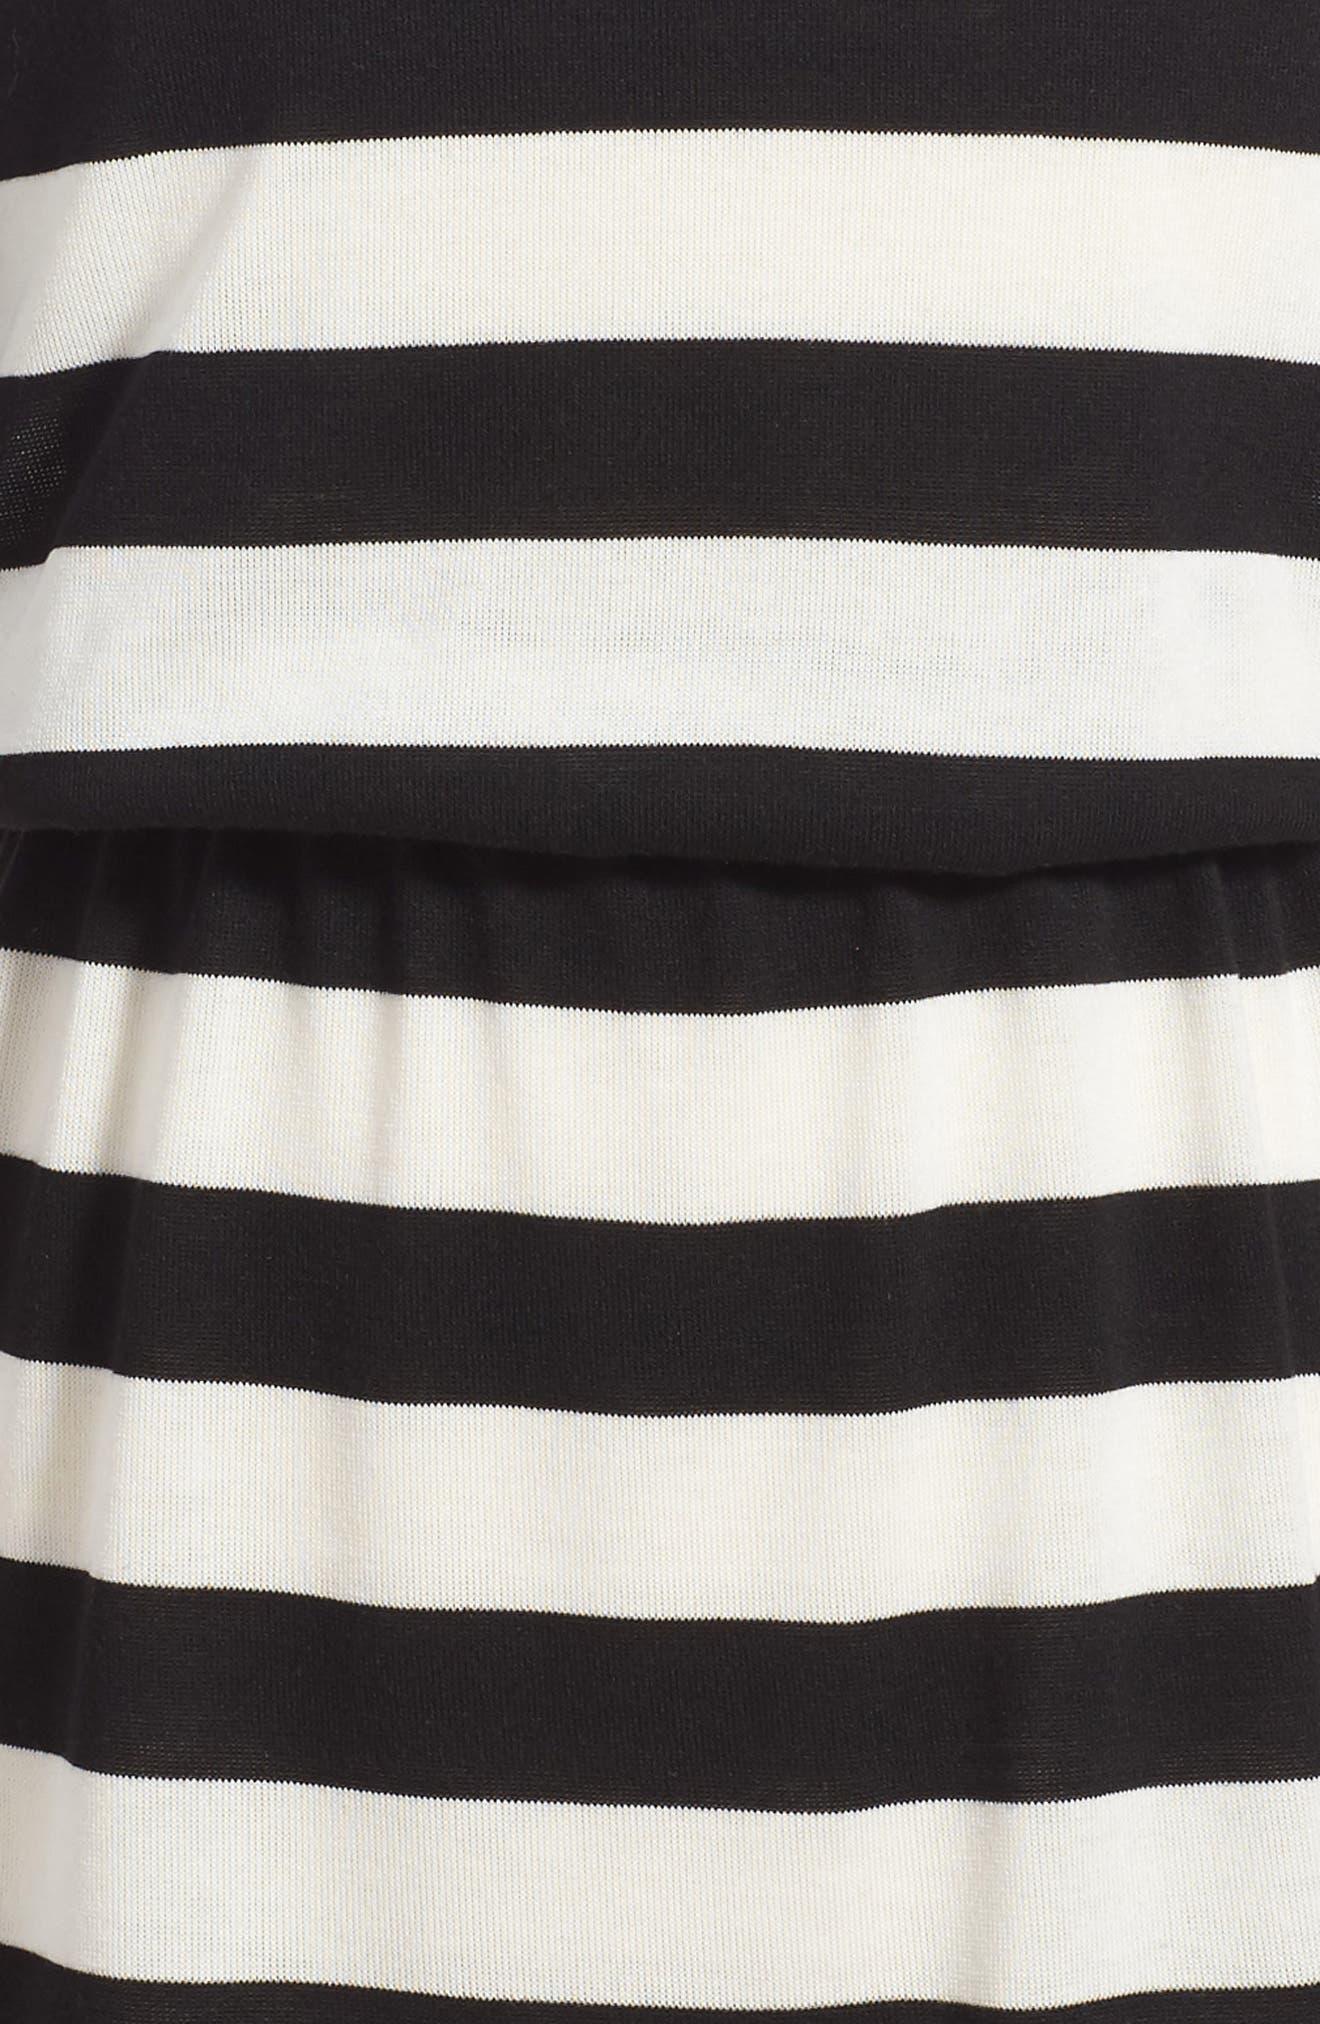 Stripe Knit Dress,                             Alternate thumbnail 3, color,                             100